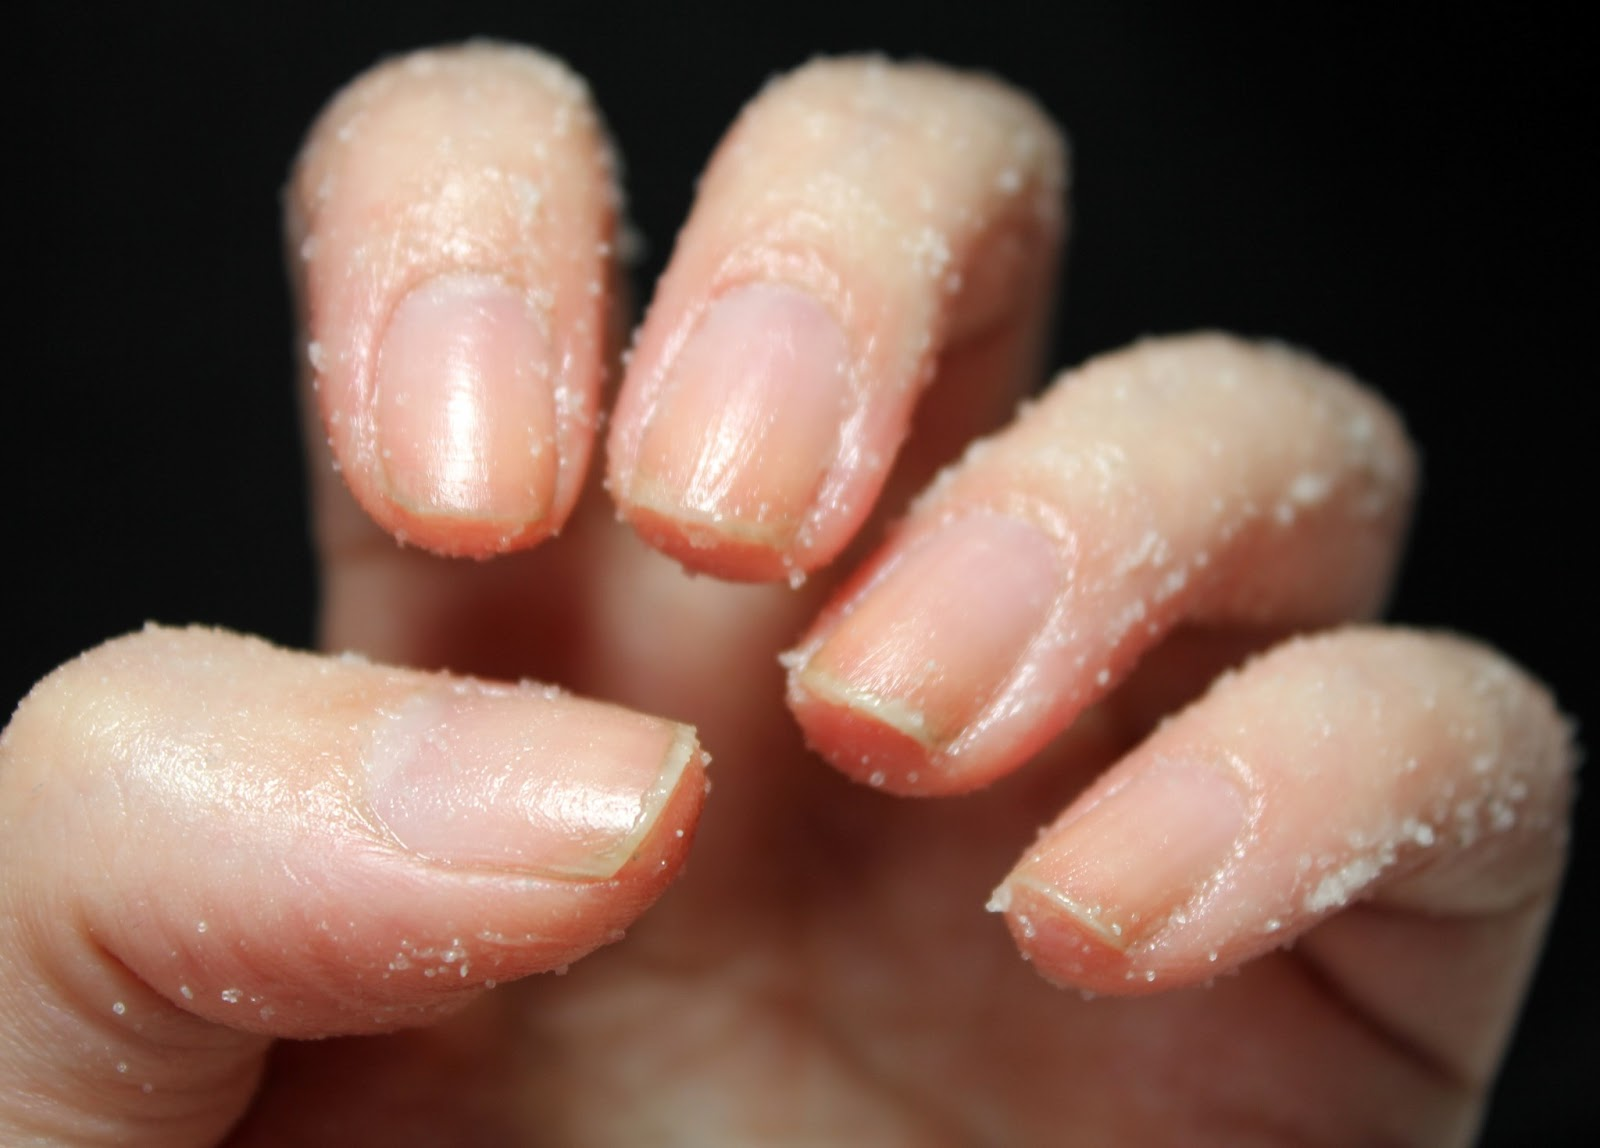 Rezultate imazhesh për nail scrub